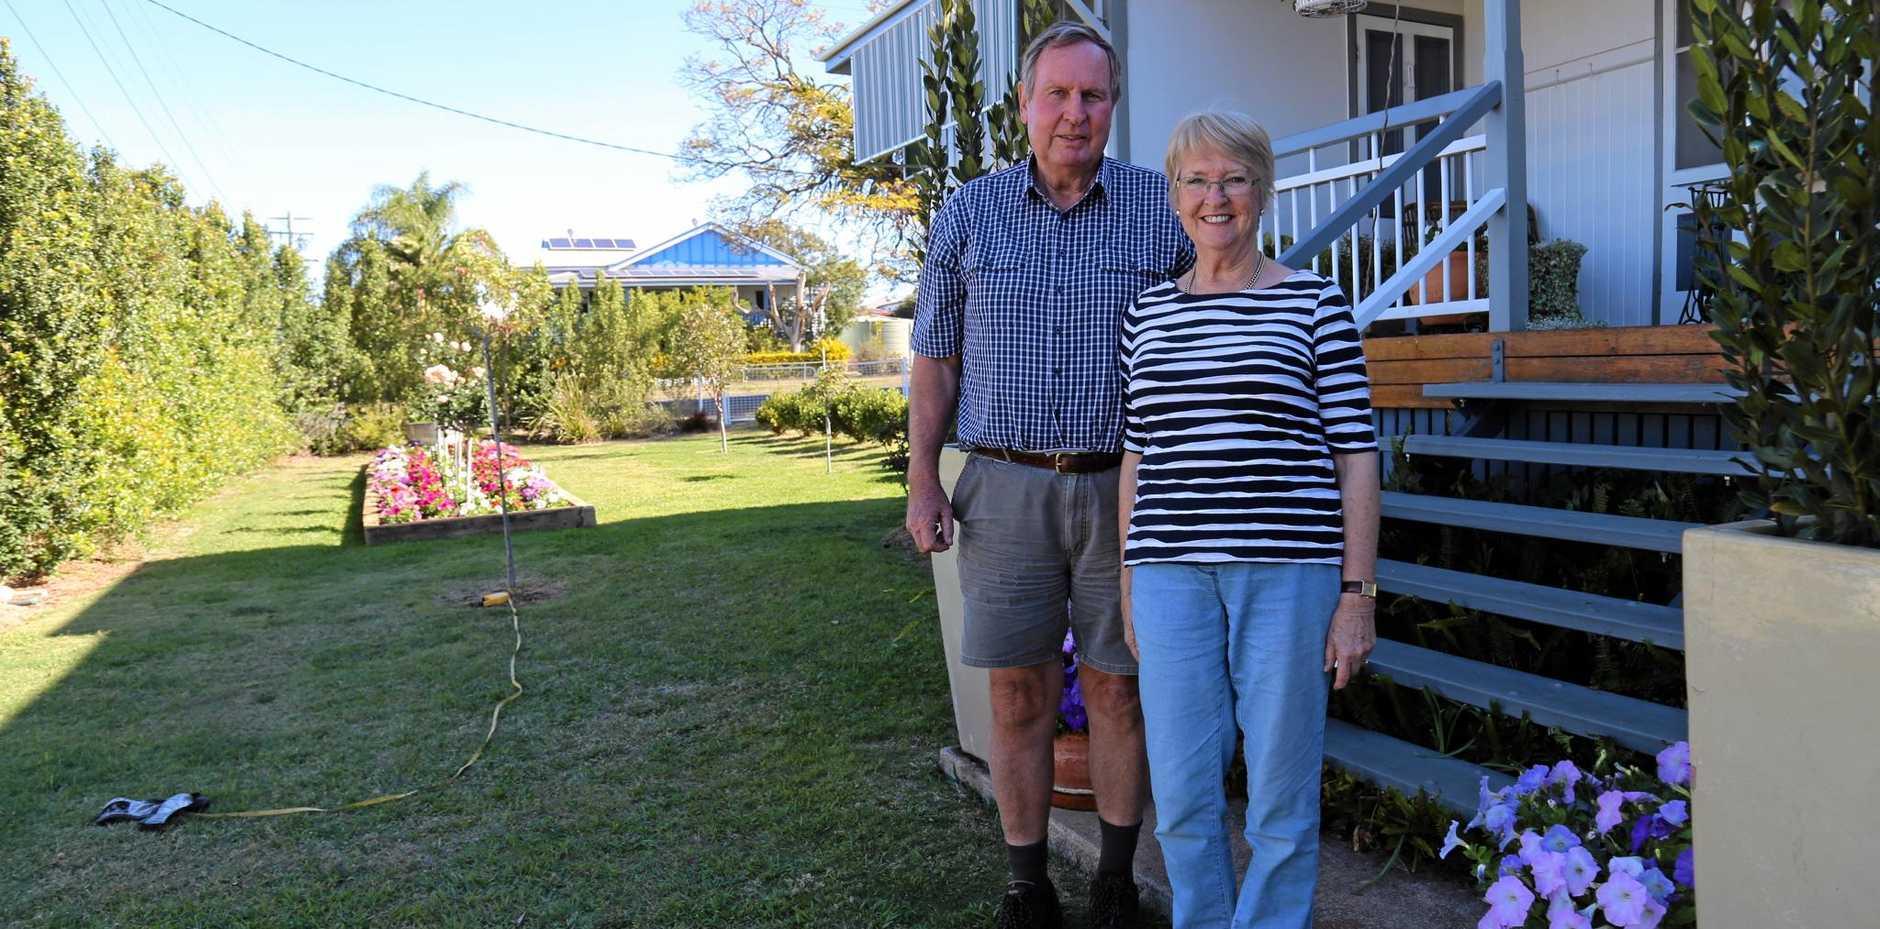 LABOUR OF LOVE: David and Maren Leng in their Garden.